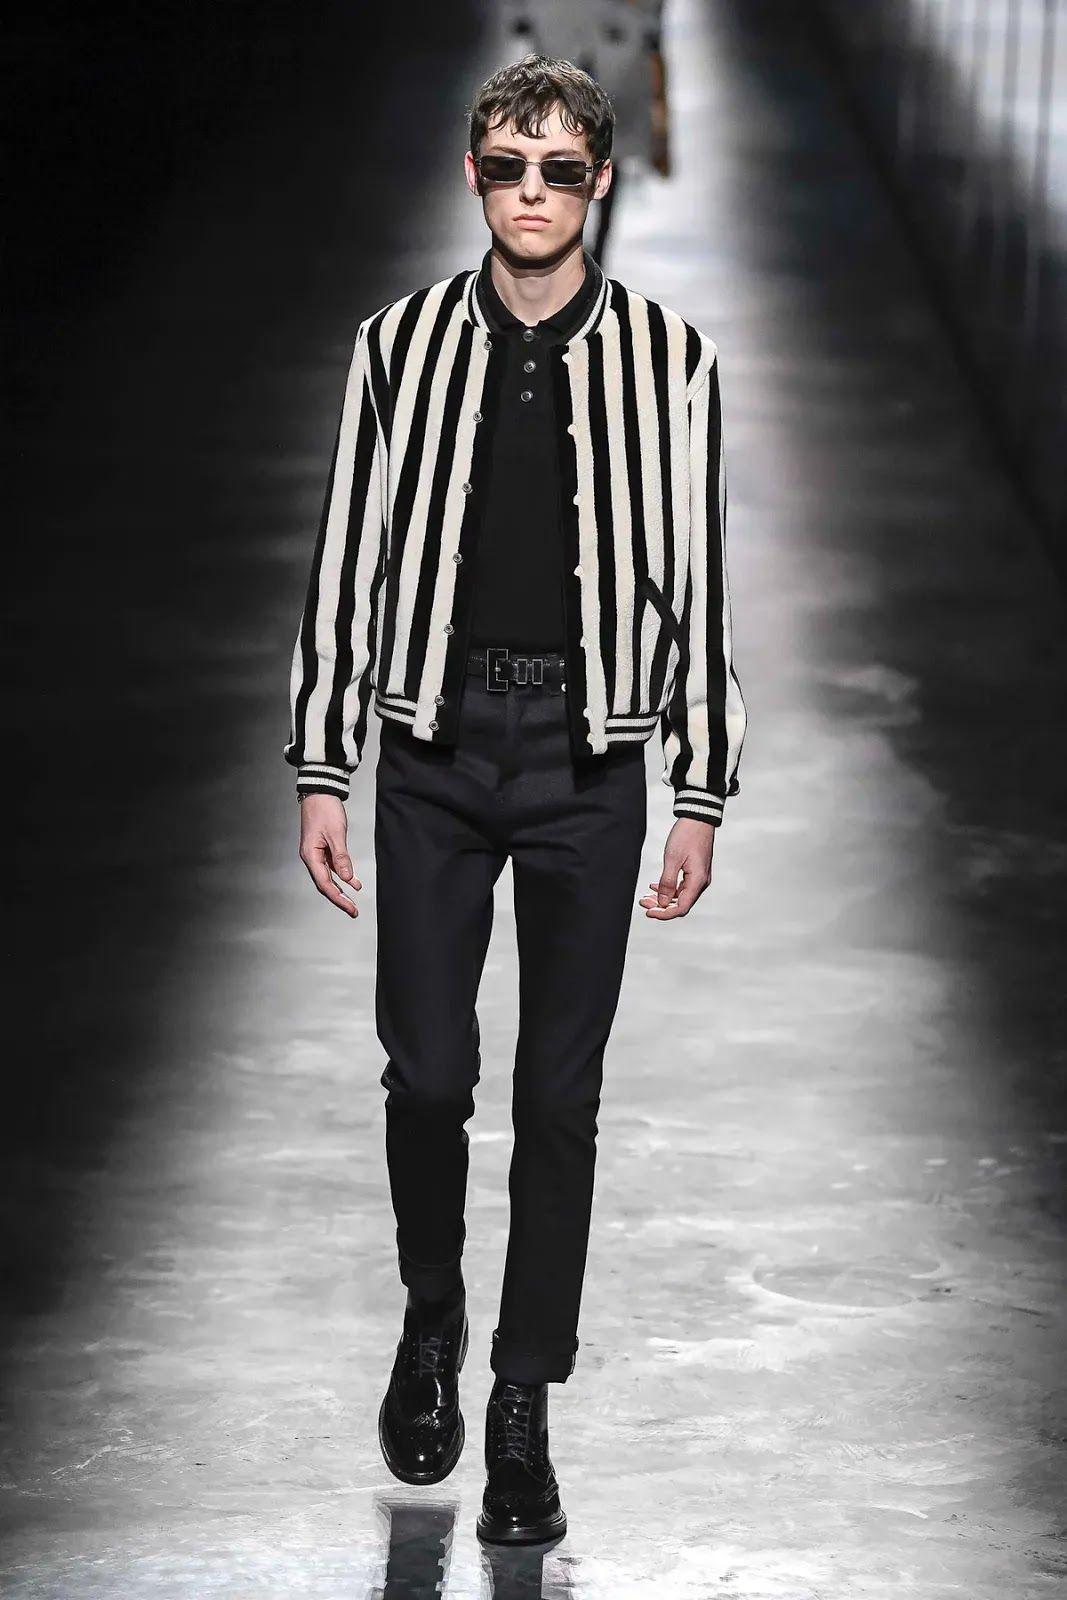 Saint Laurent Fall Winter 2019 20 Paris Fashion Week in